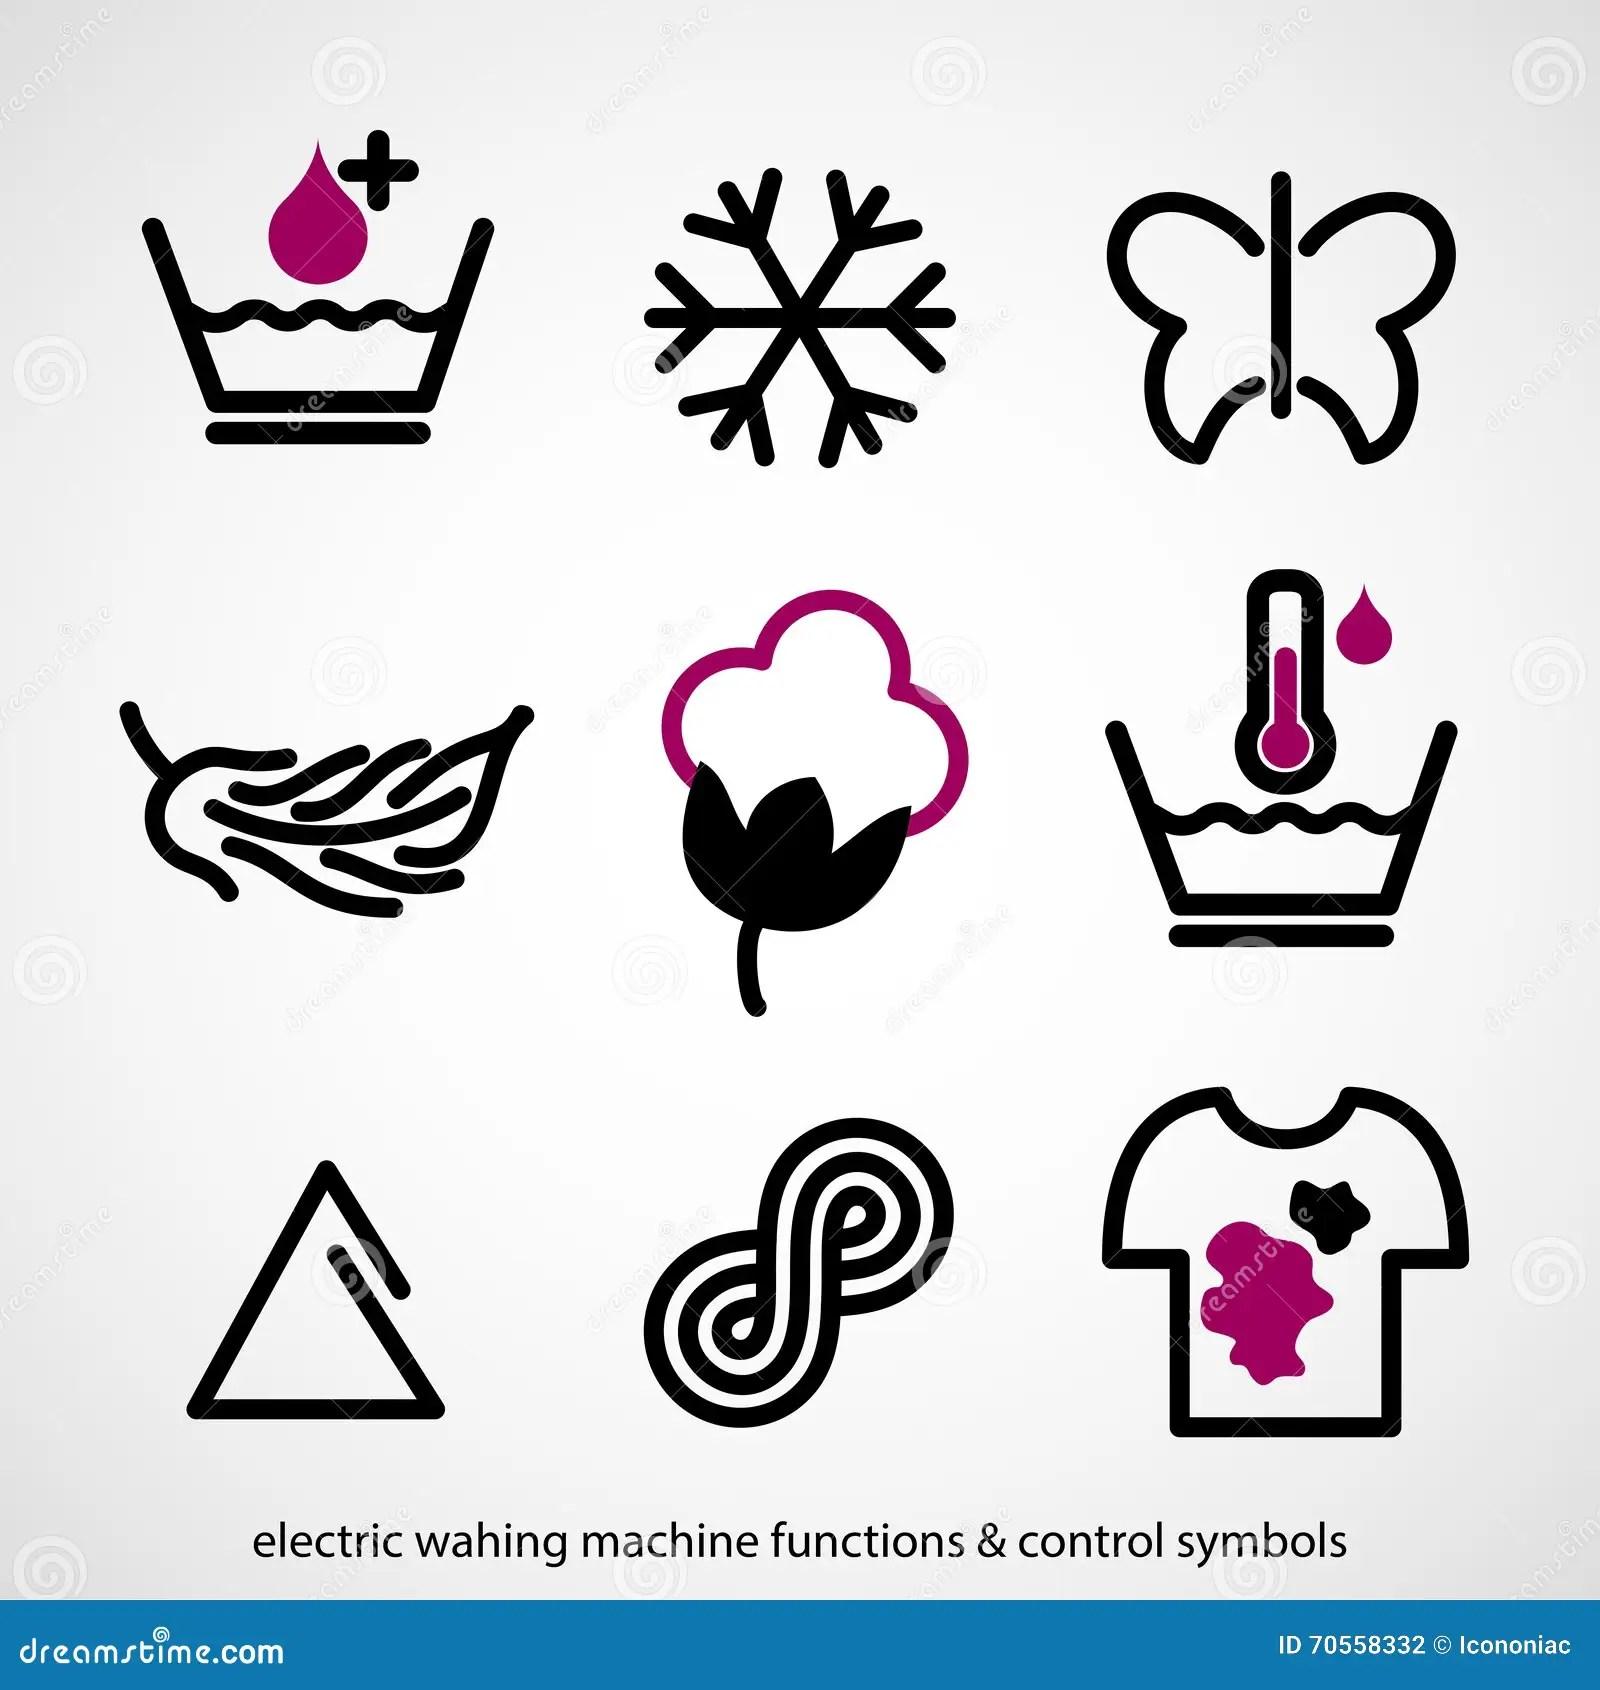 Electric Washing Machine Functions & Control Symbols Stock